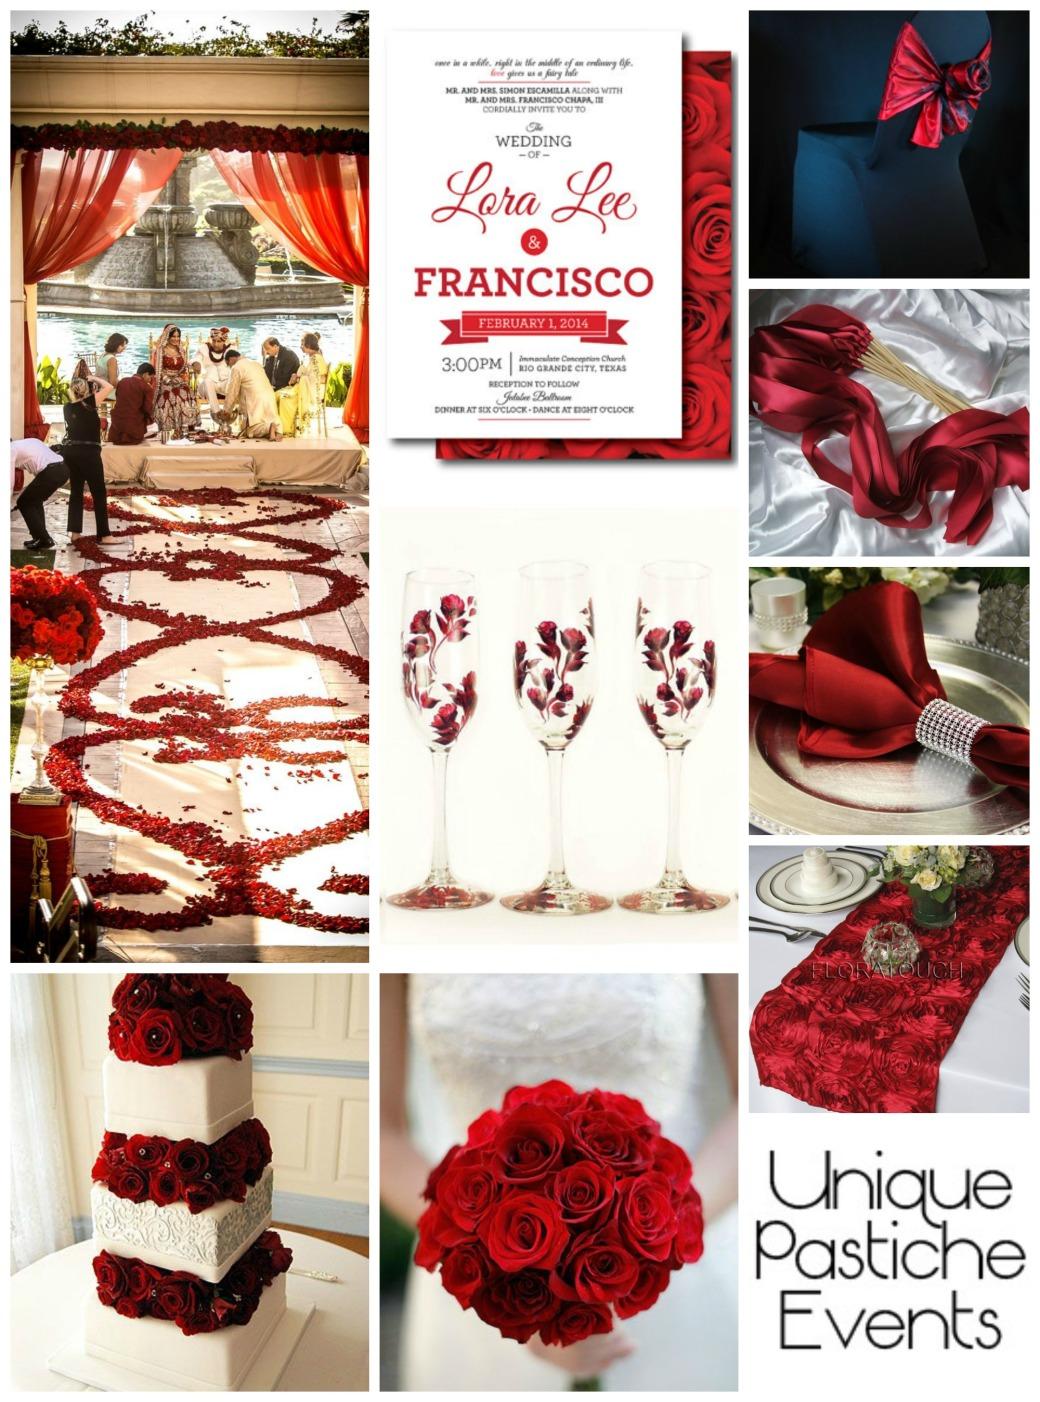 Wedding Inspiration | Unique Pastiche Events